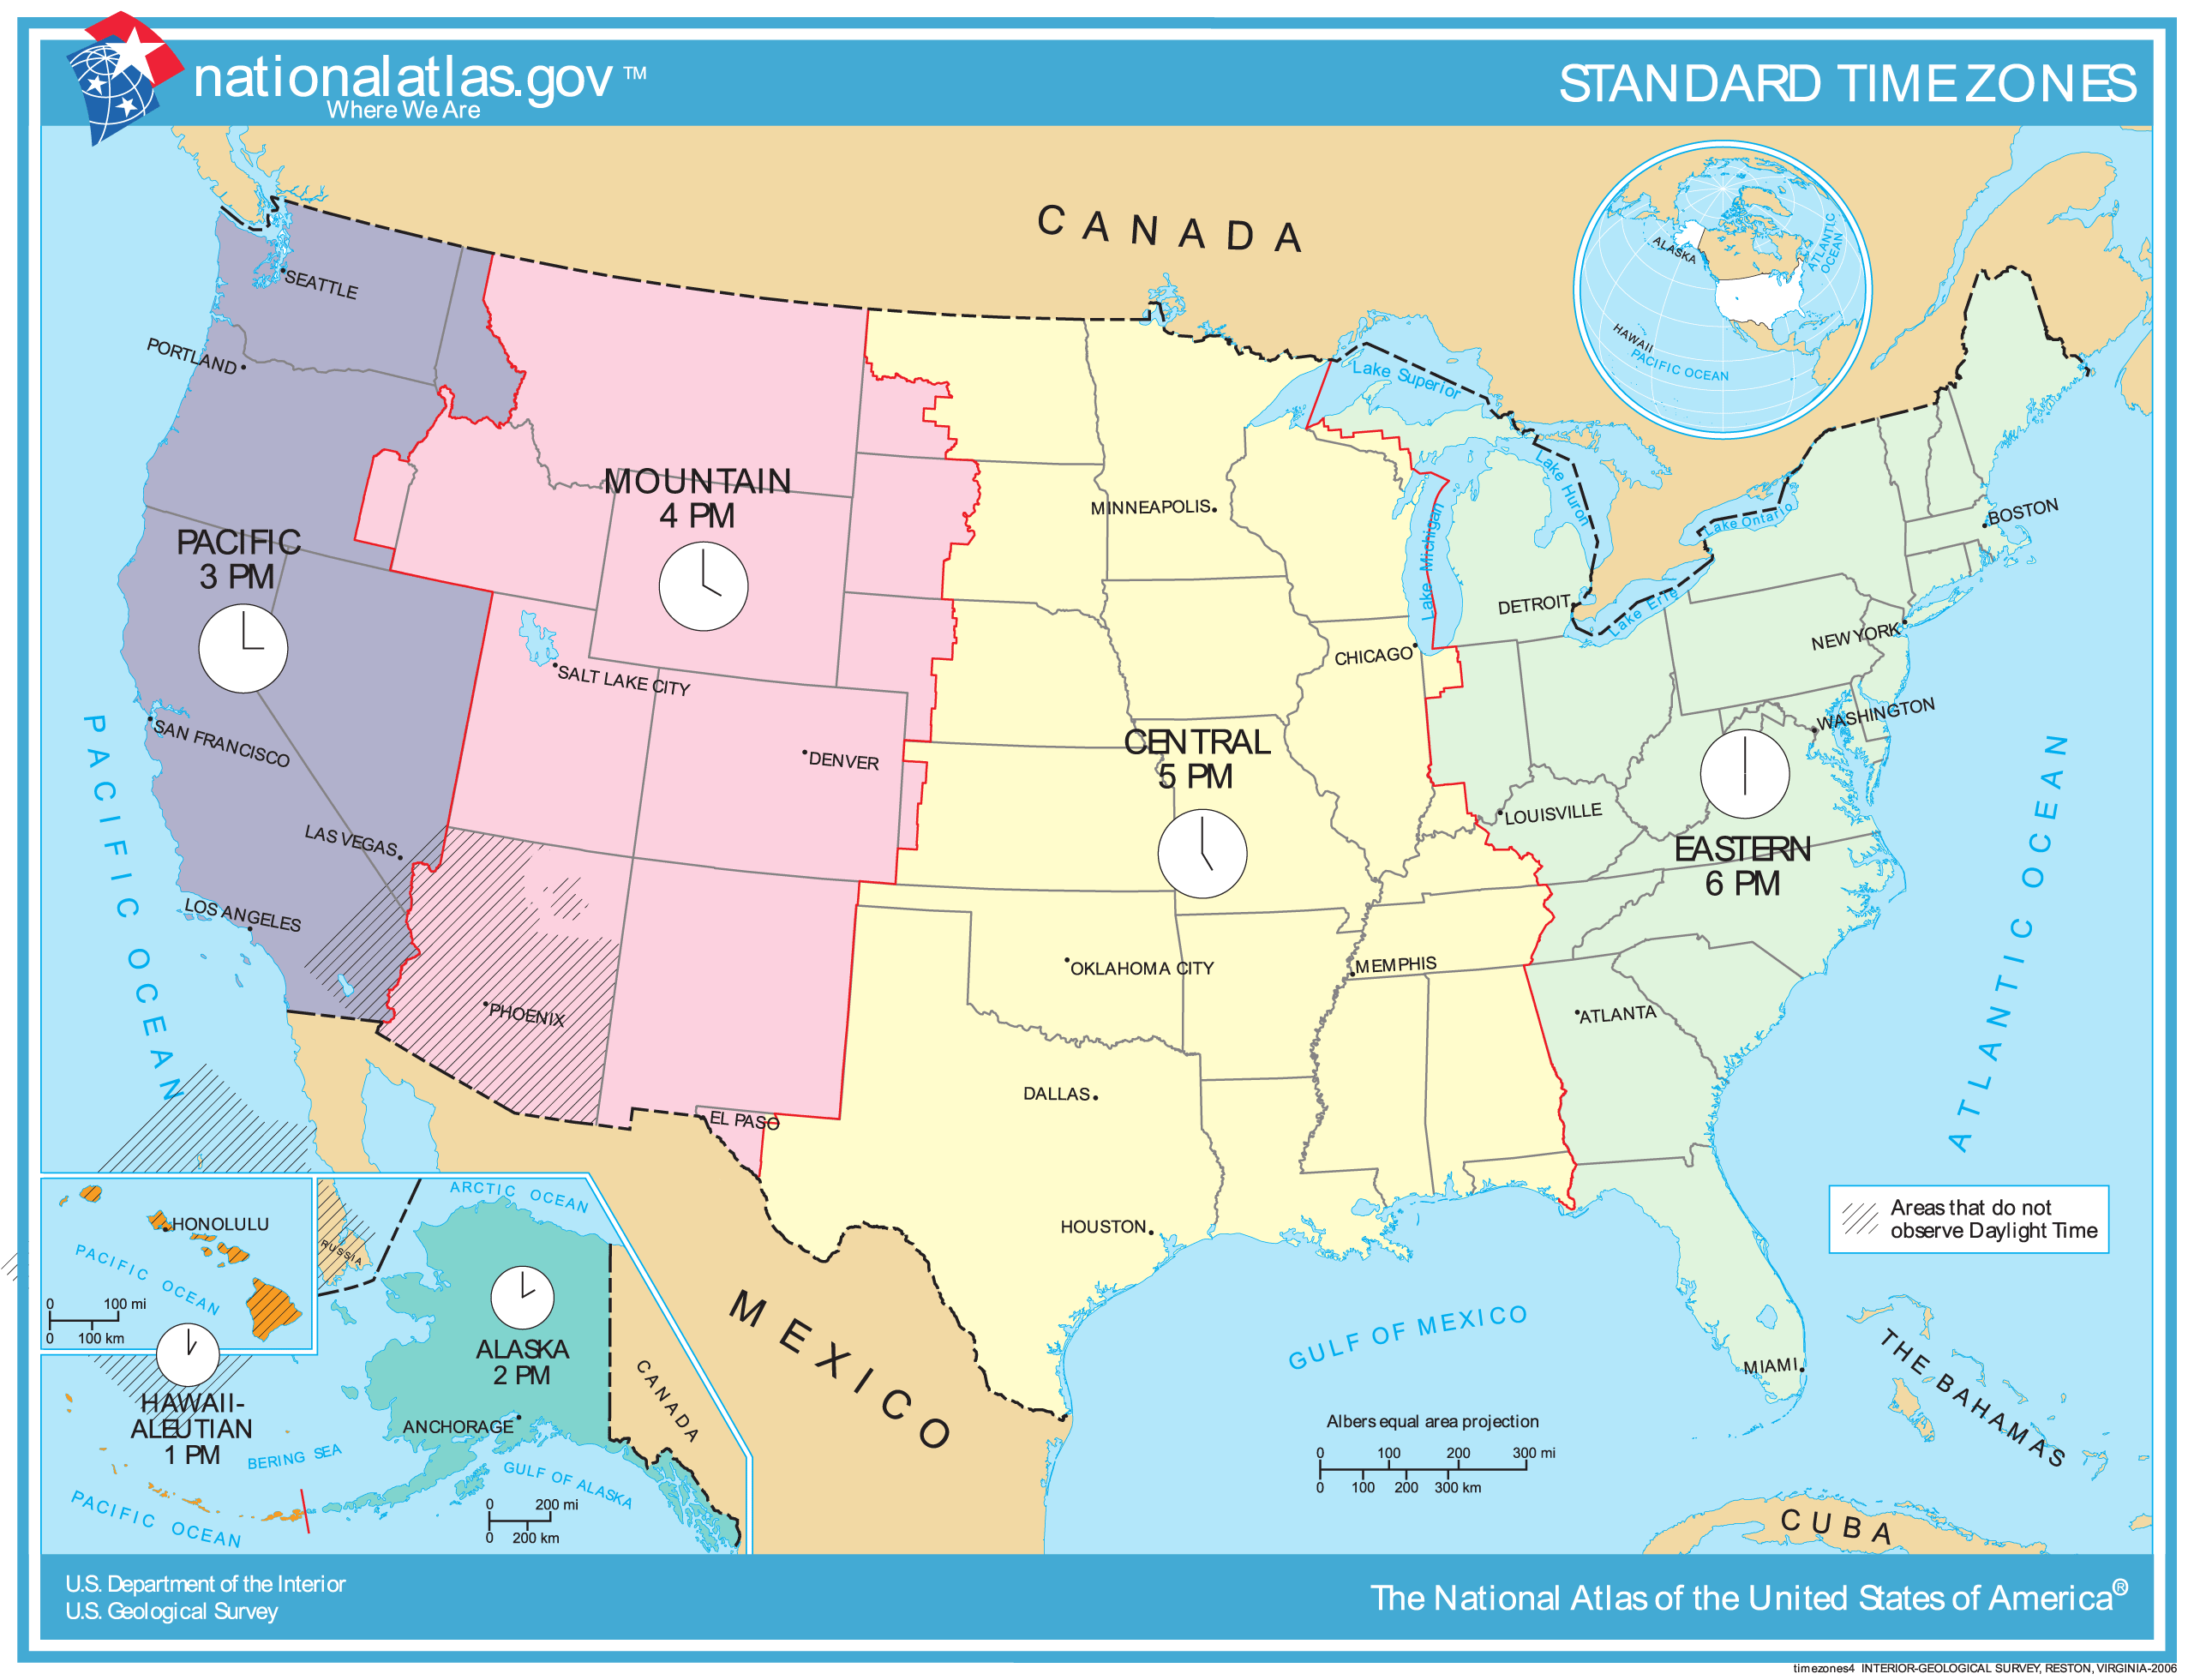 United States Time Zone Map Mapsof